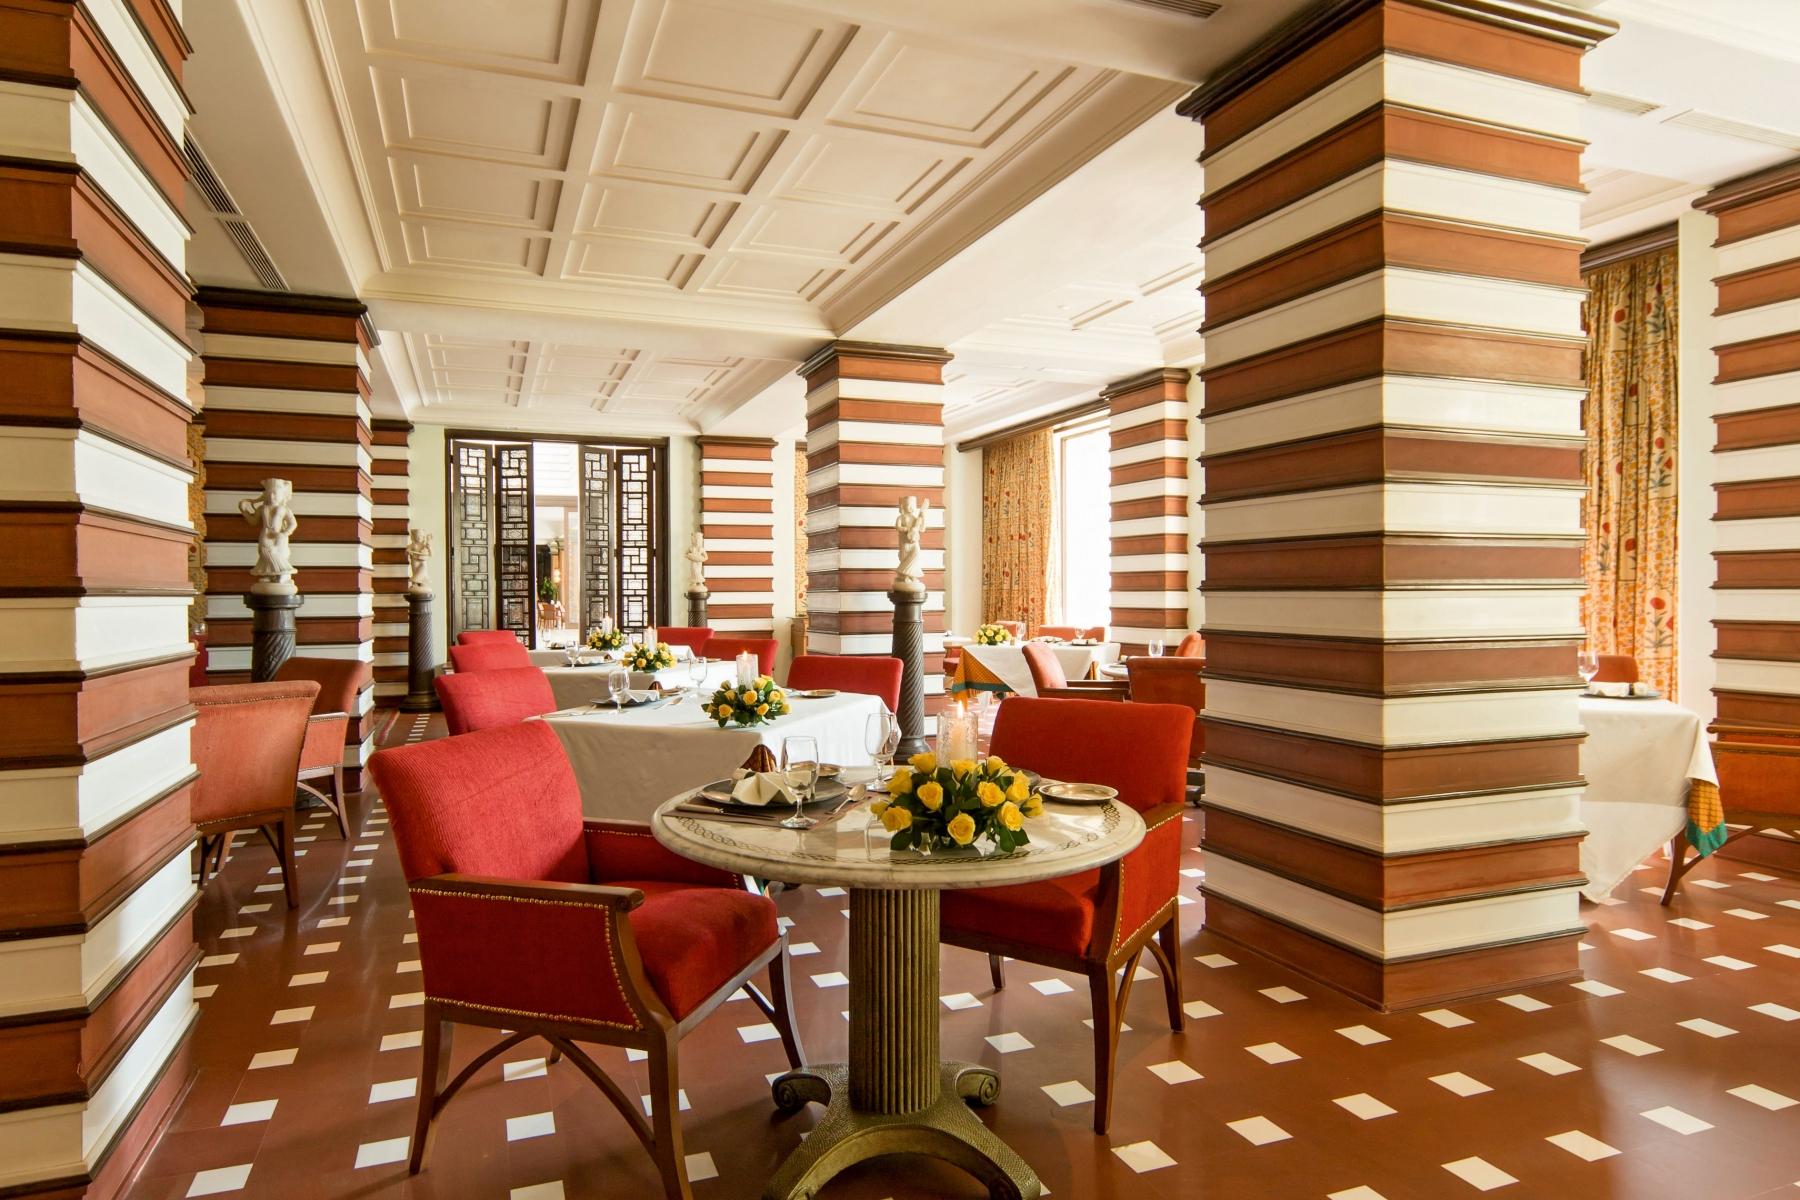 014-The-Oberoi-Amarvilas-Agra-Esphahan-restaurant-min